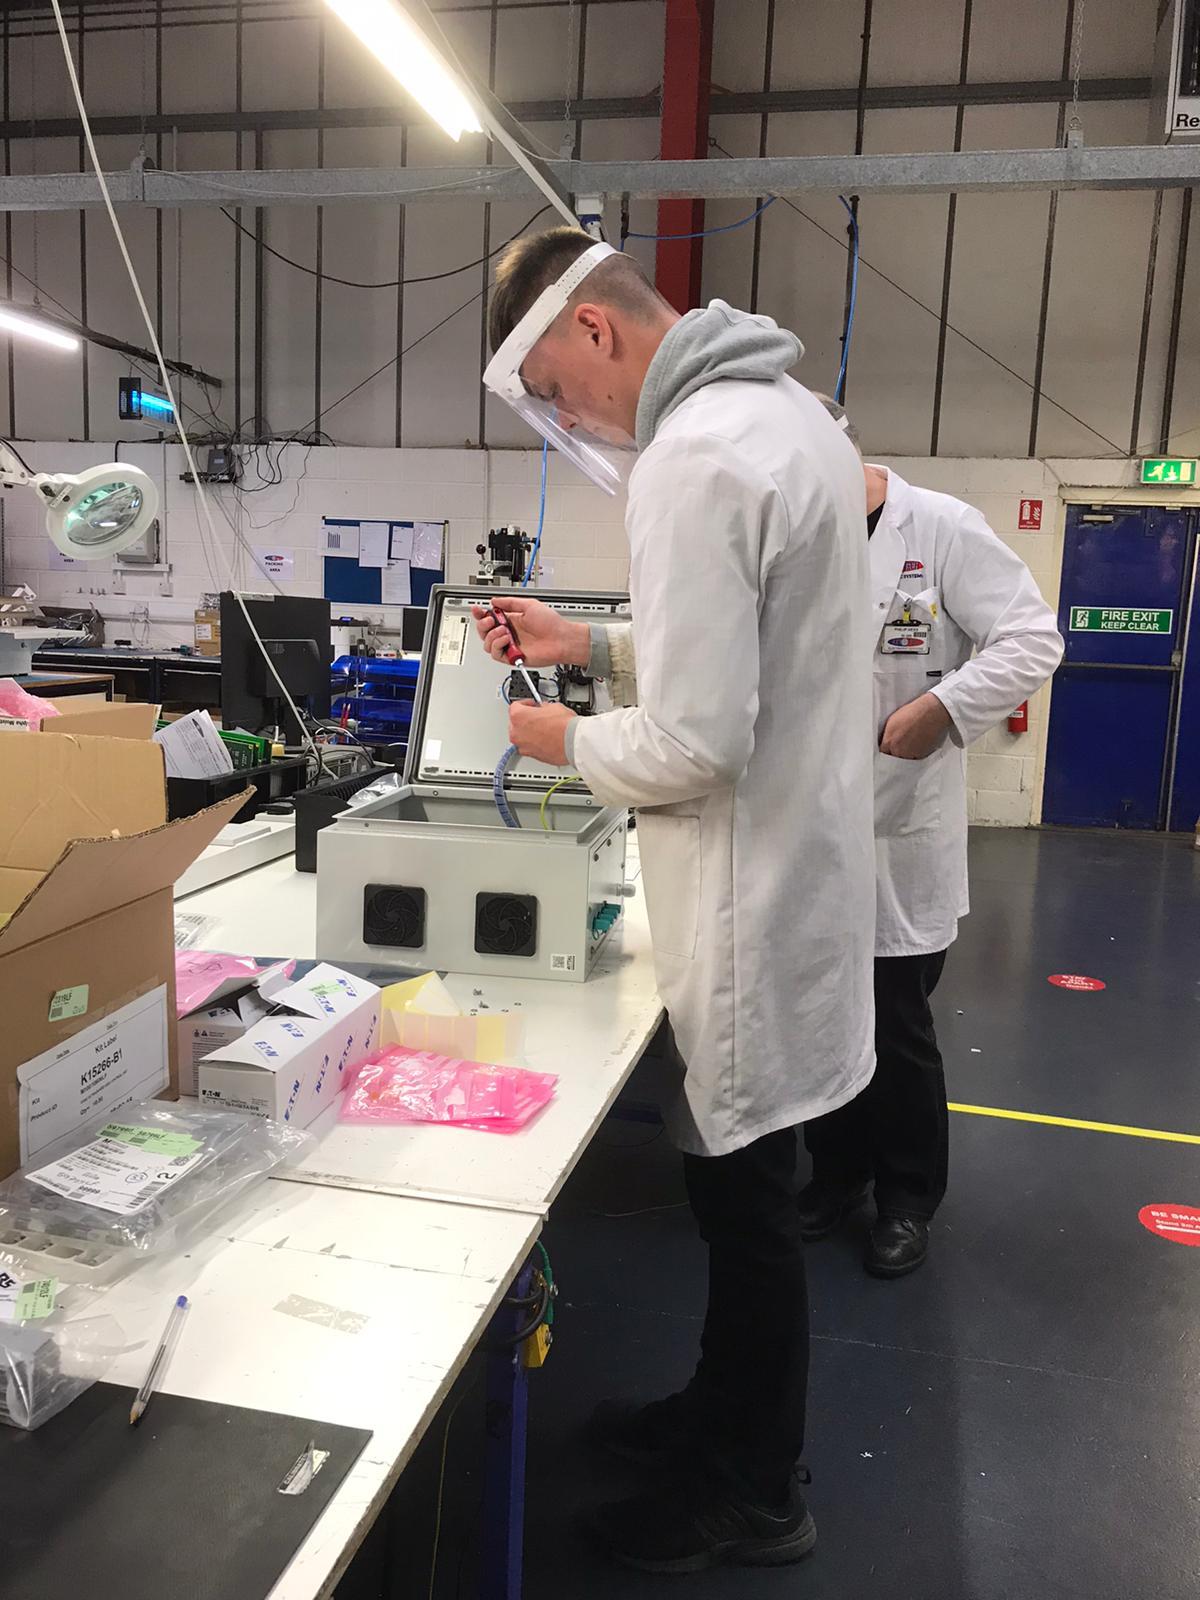 MPGS Launches Ultraguard Antifouling